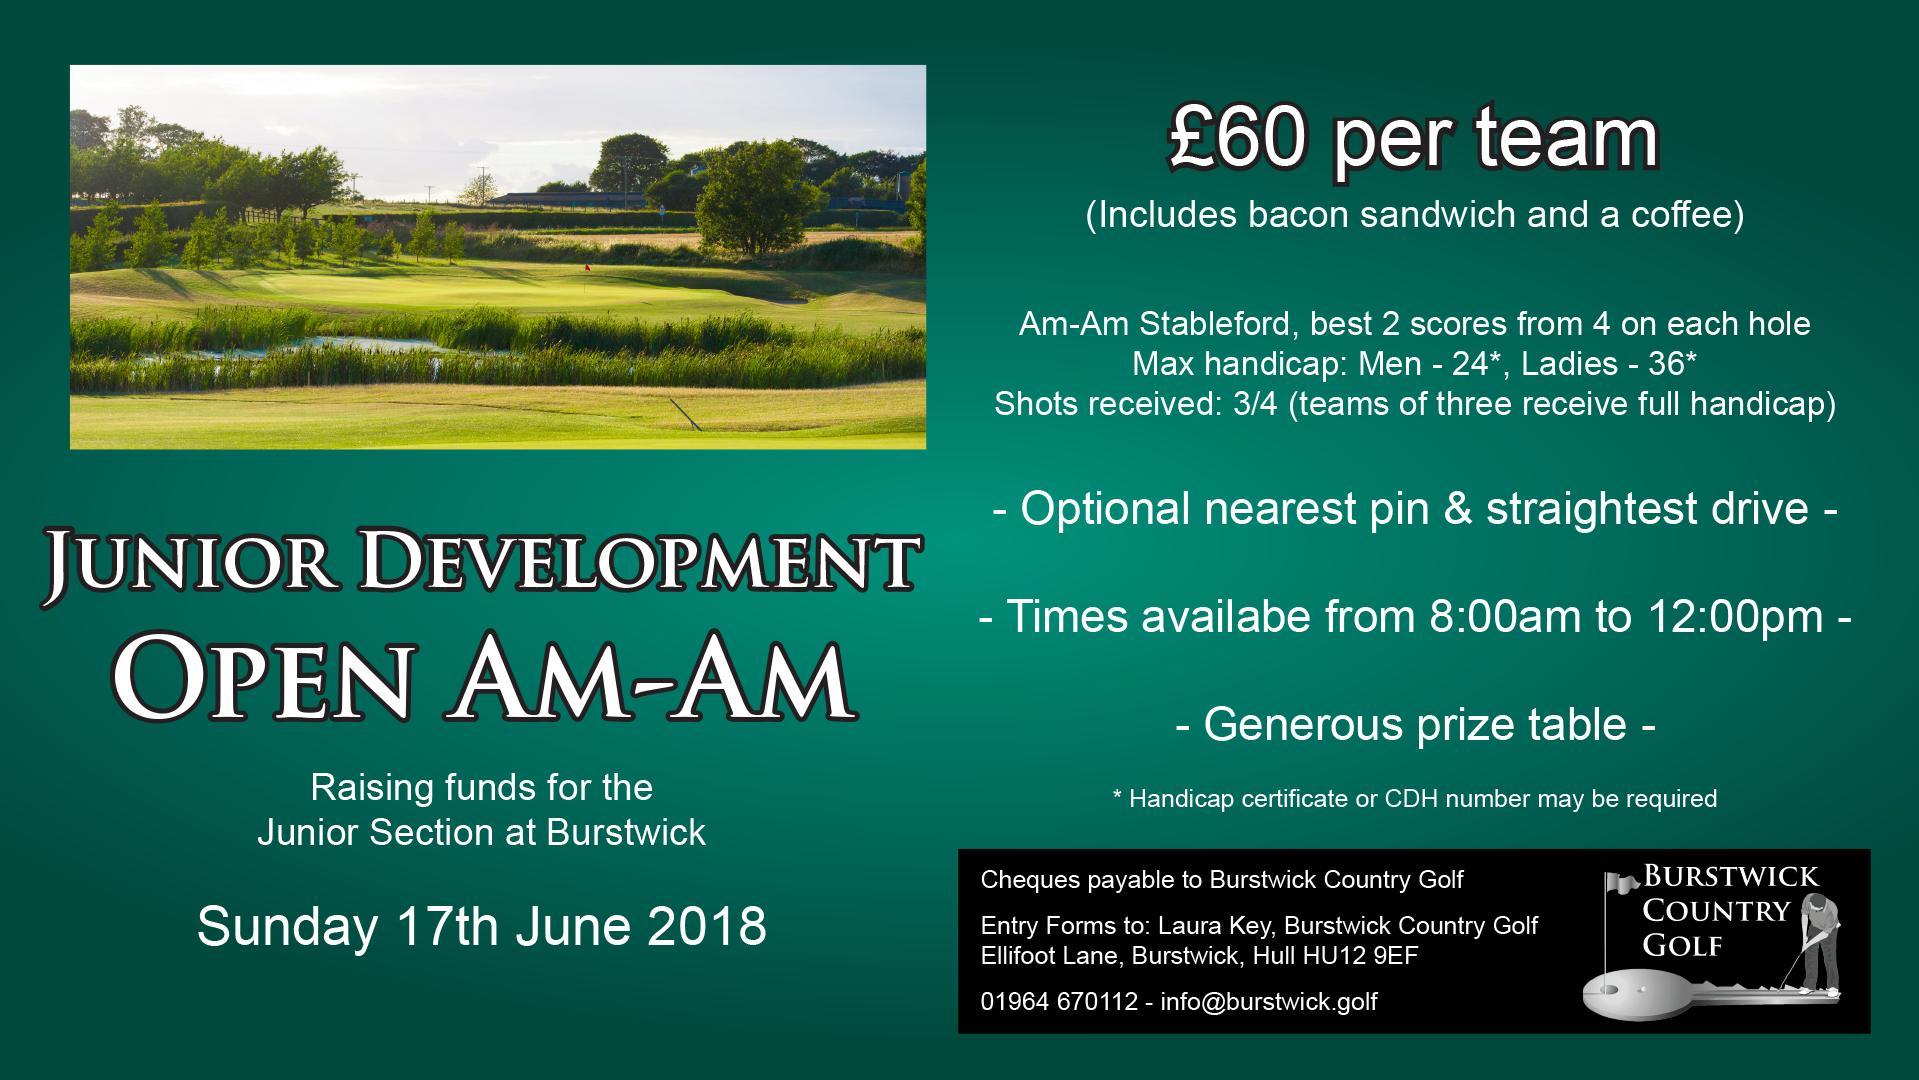 Junior Development Fundraising Am-Am